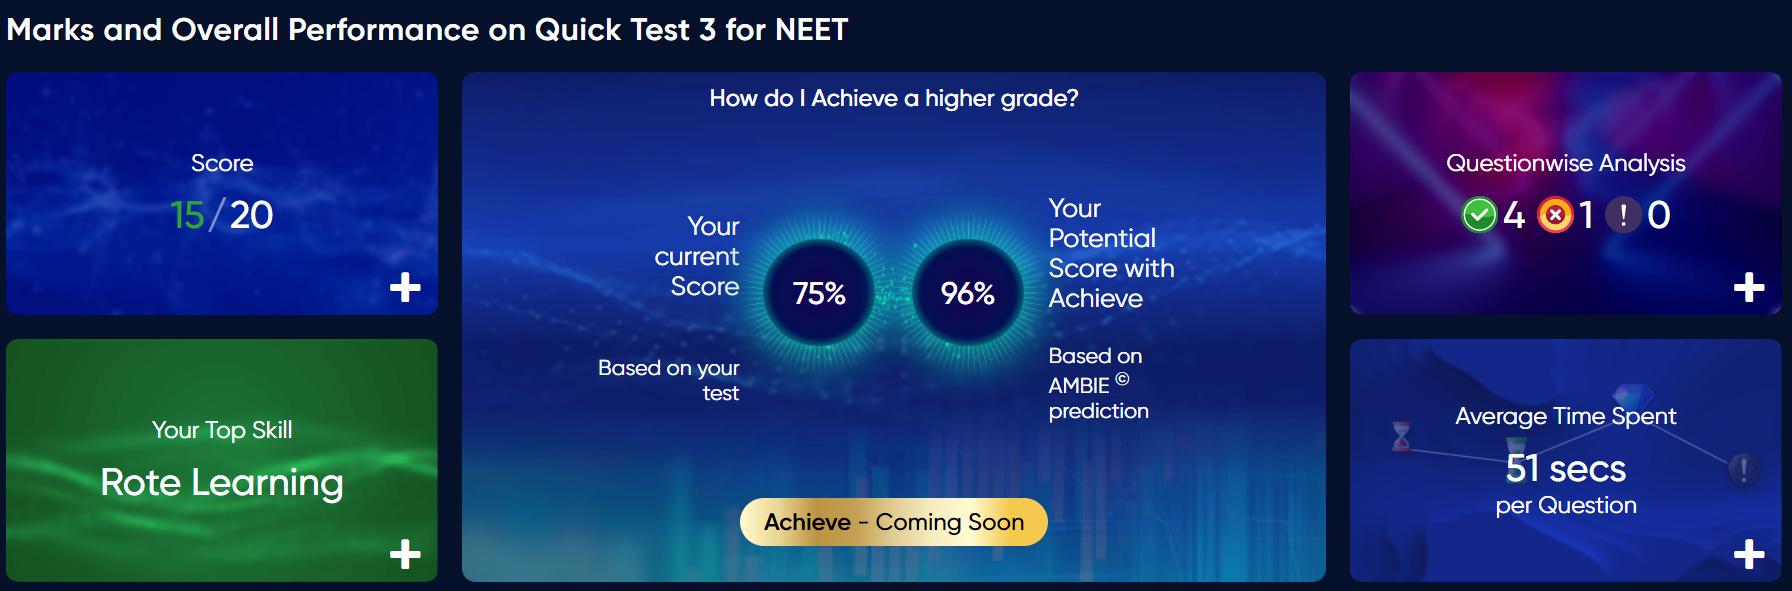 NEET Overall Test Feedback